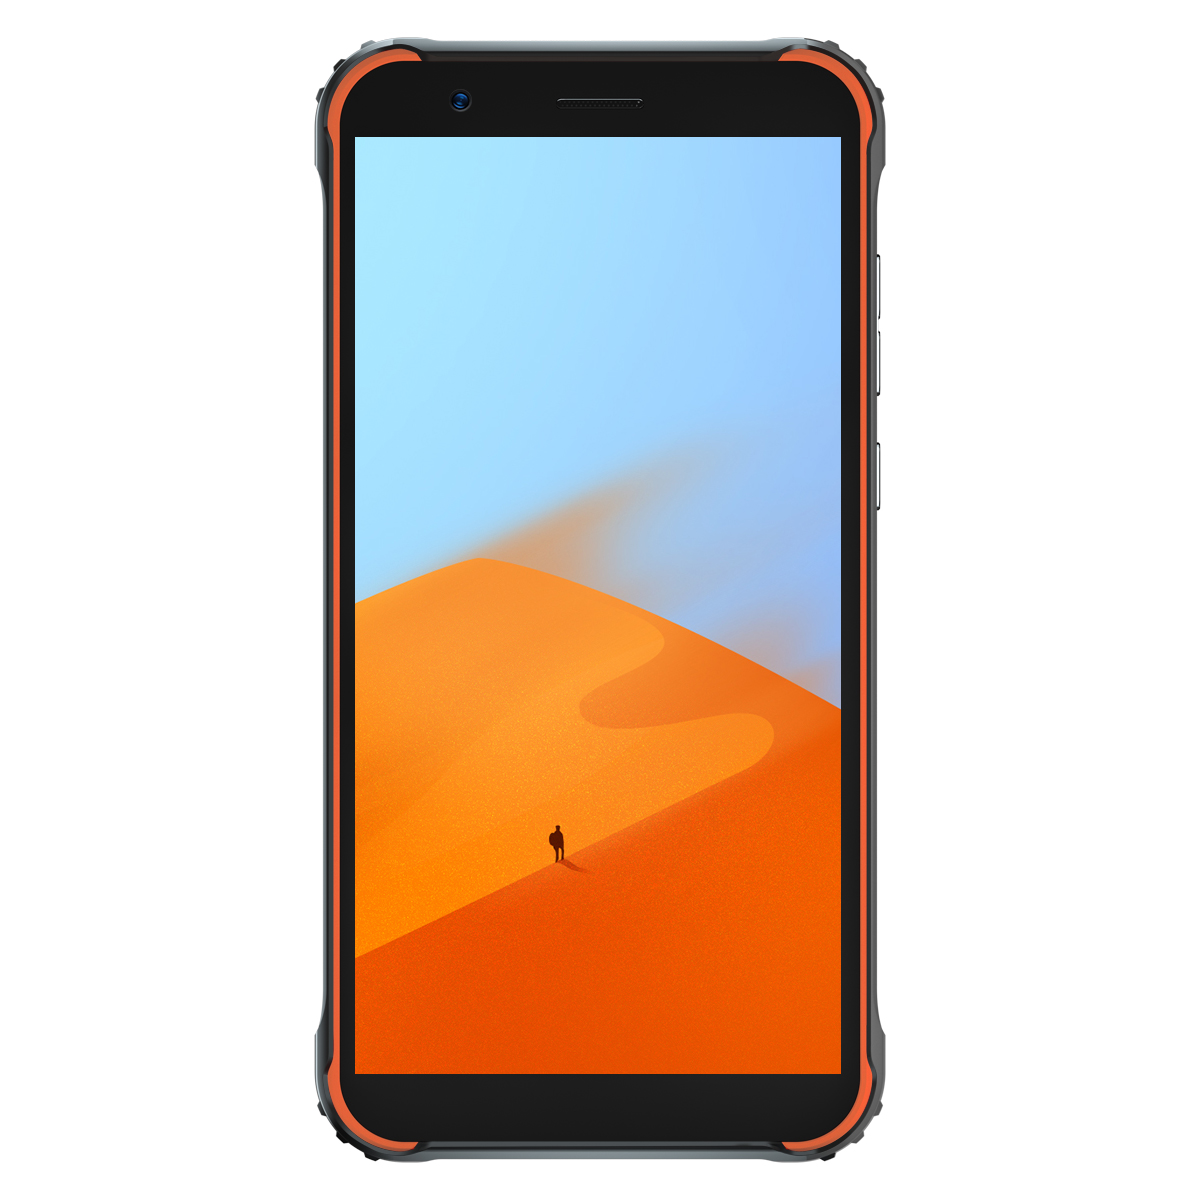 Mobile Phone BV4900 3GB+32GB 5.7 Inch Android 10 Smart phone Orange_3GB+32GB